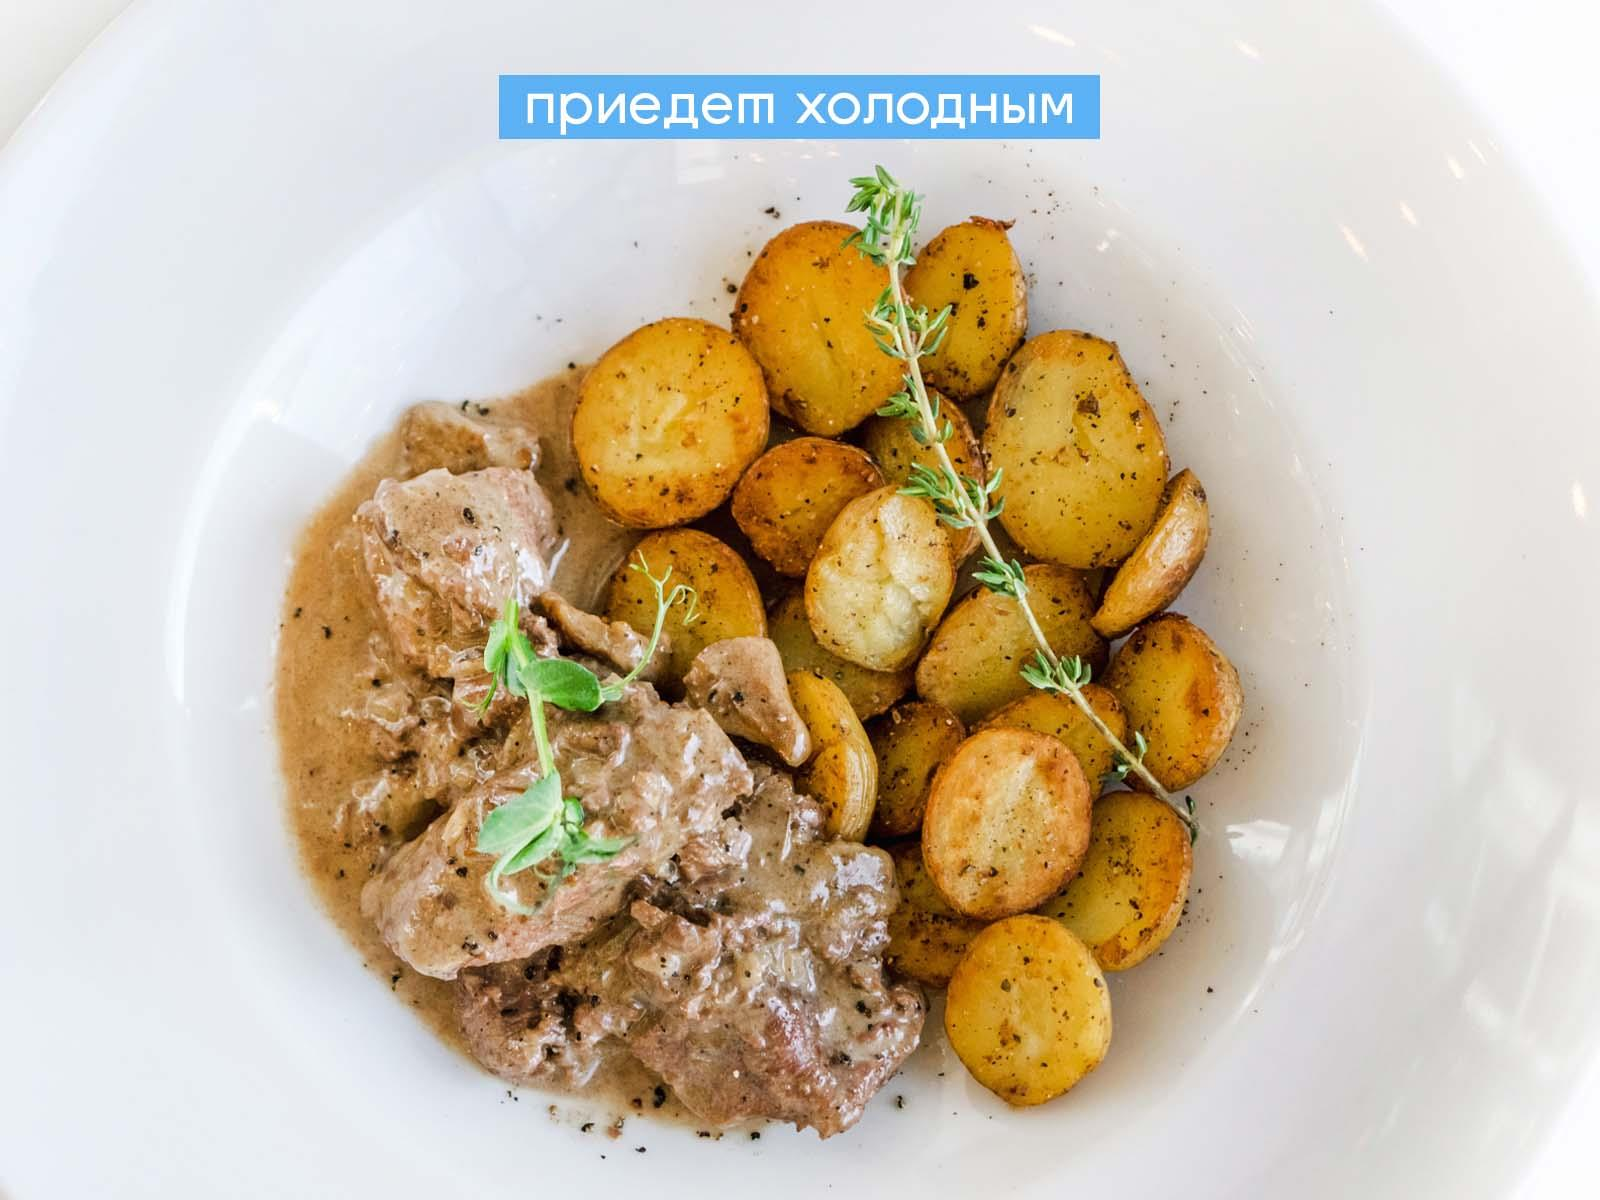 Говядина с грибами с картофелем 250 г (гмс)